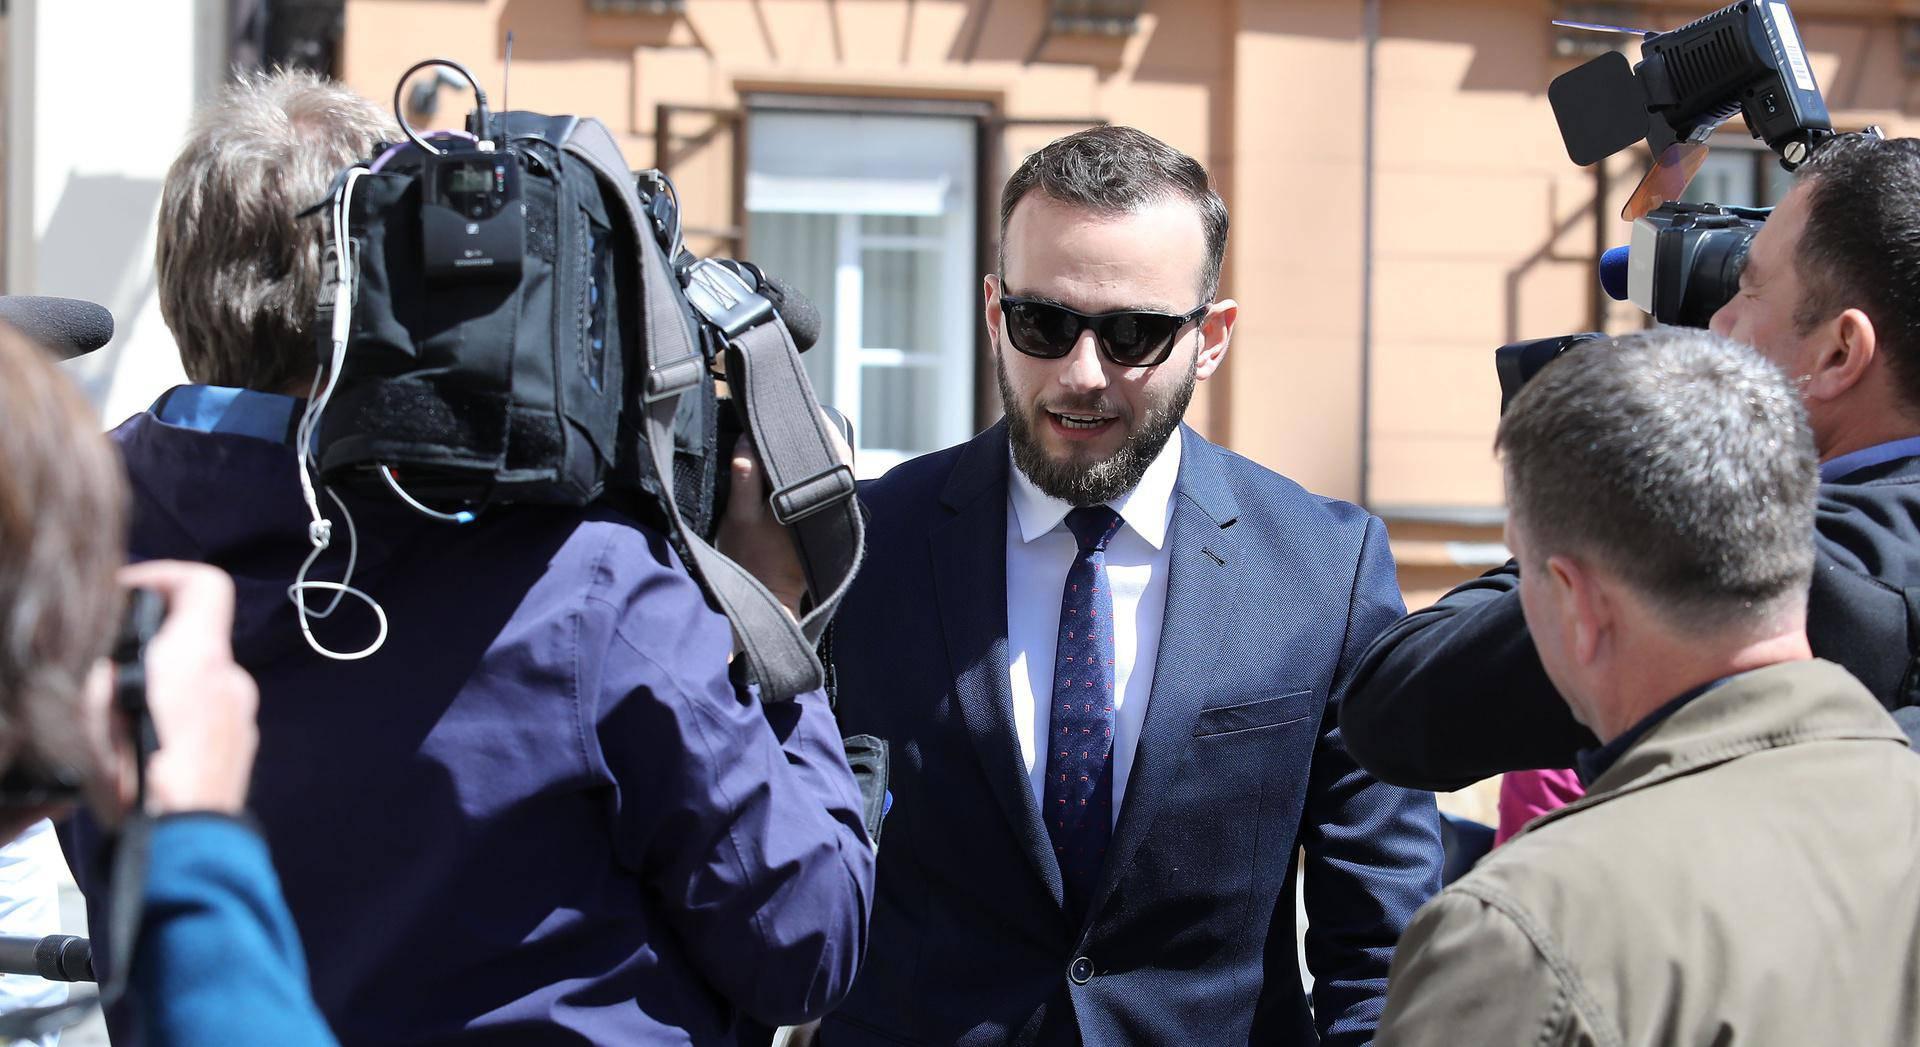 Zagreb: Ministar Aladrović dolazi u Banske dvore